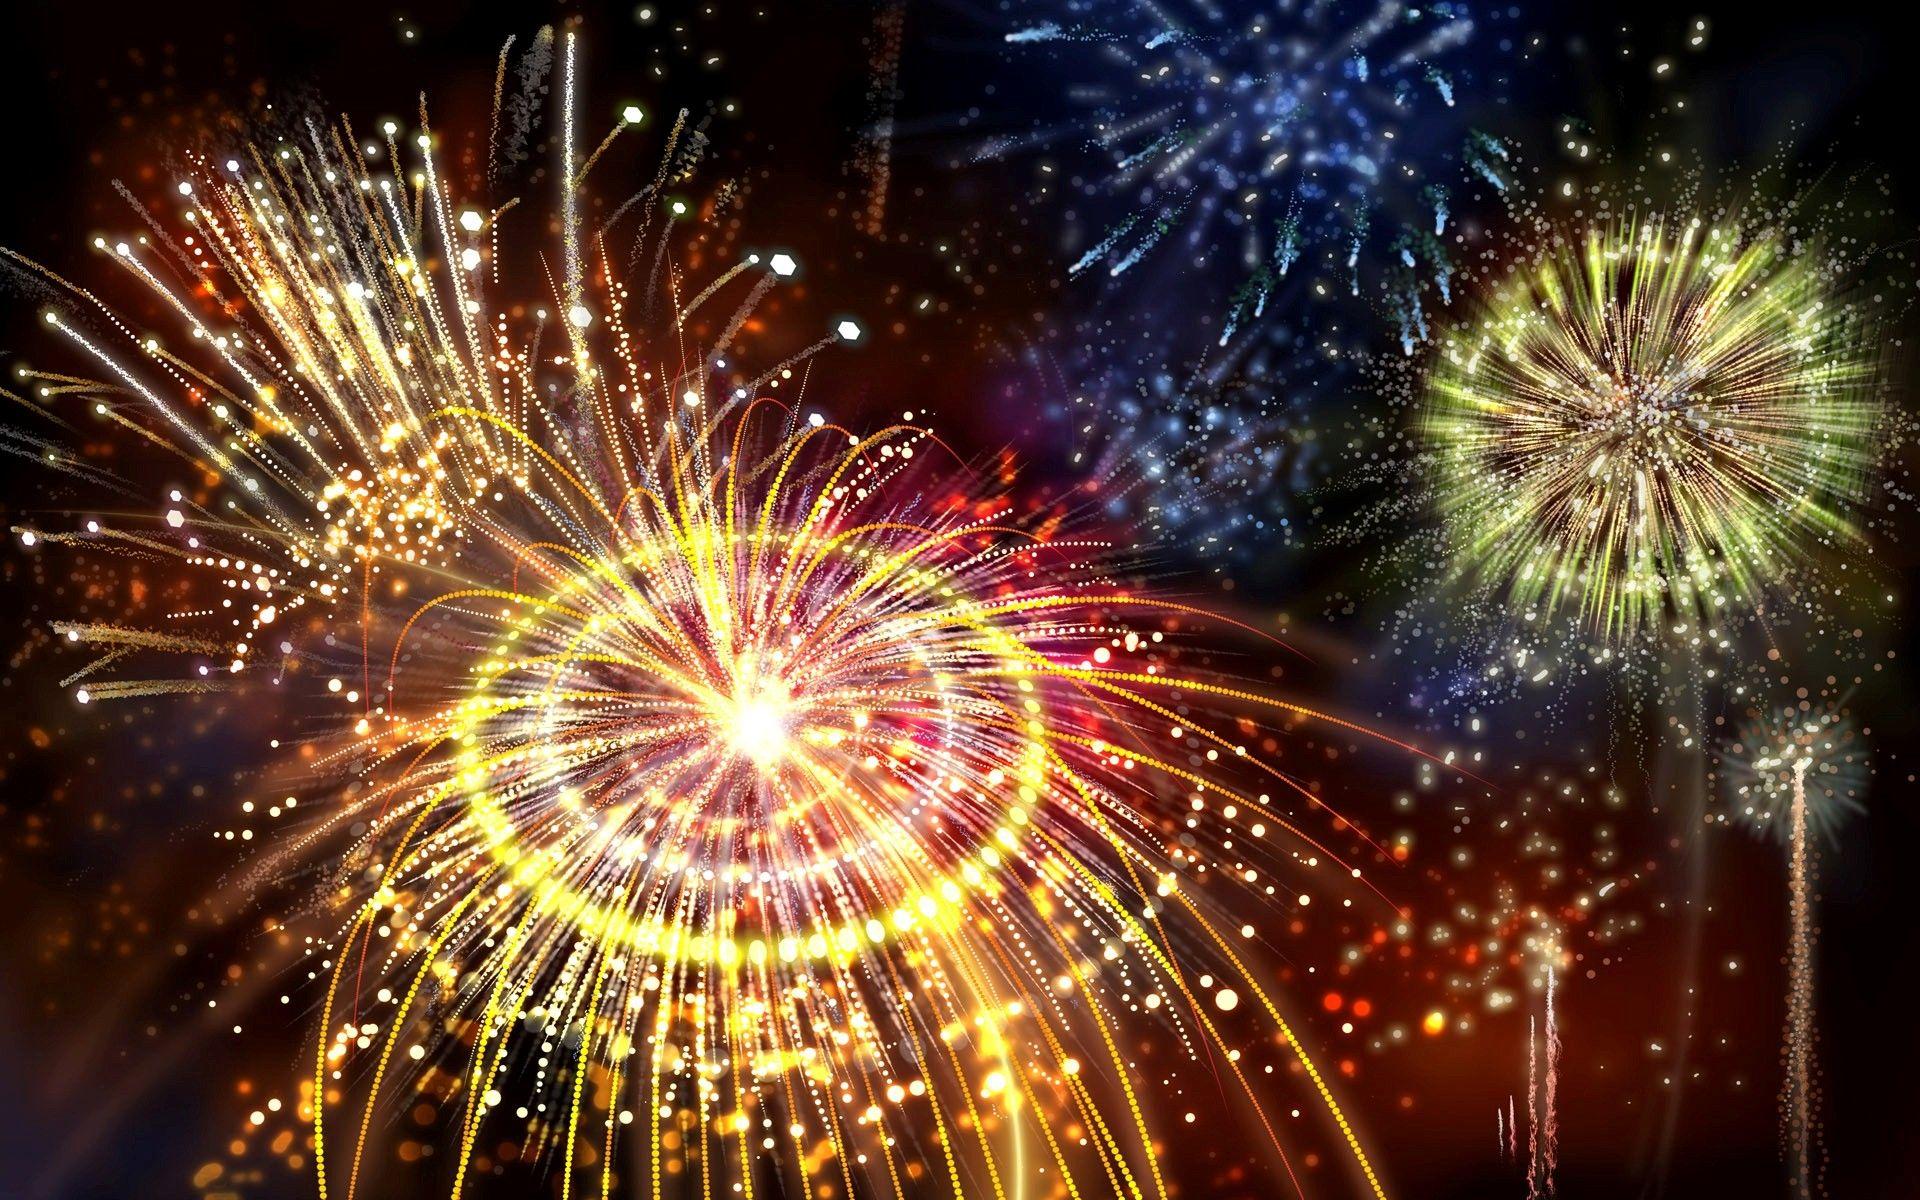 Cracker clipart fireworks night. Pin on diwali